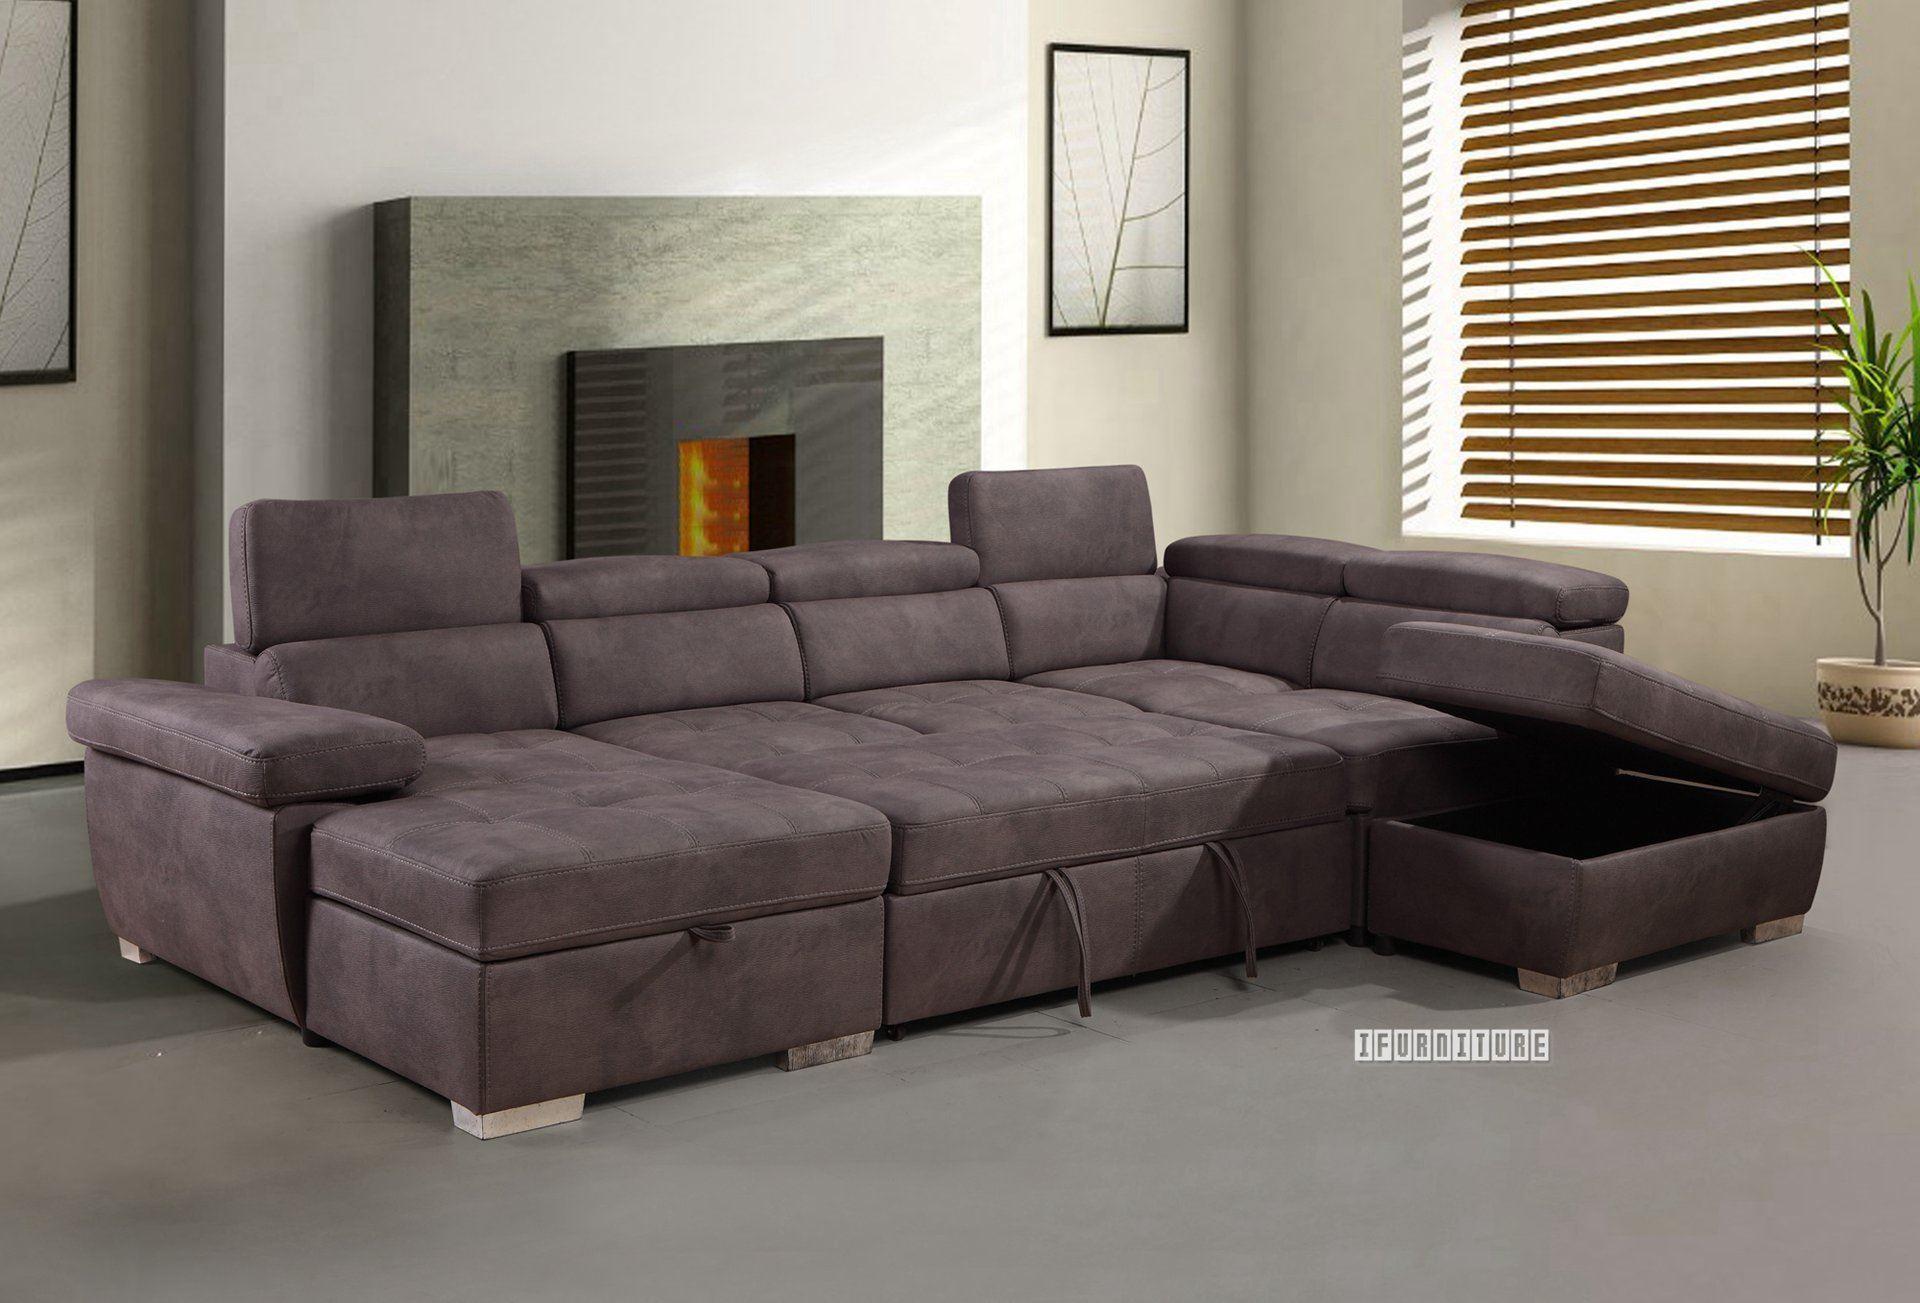 Amando Sectional Sofa/ Sofa Bed With Storage *Titanium Grey Inside Hartford Storage Sectional Futon Sofas (View 7 of 15)